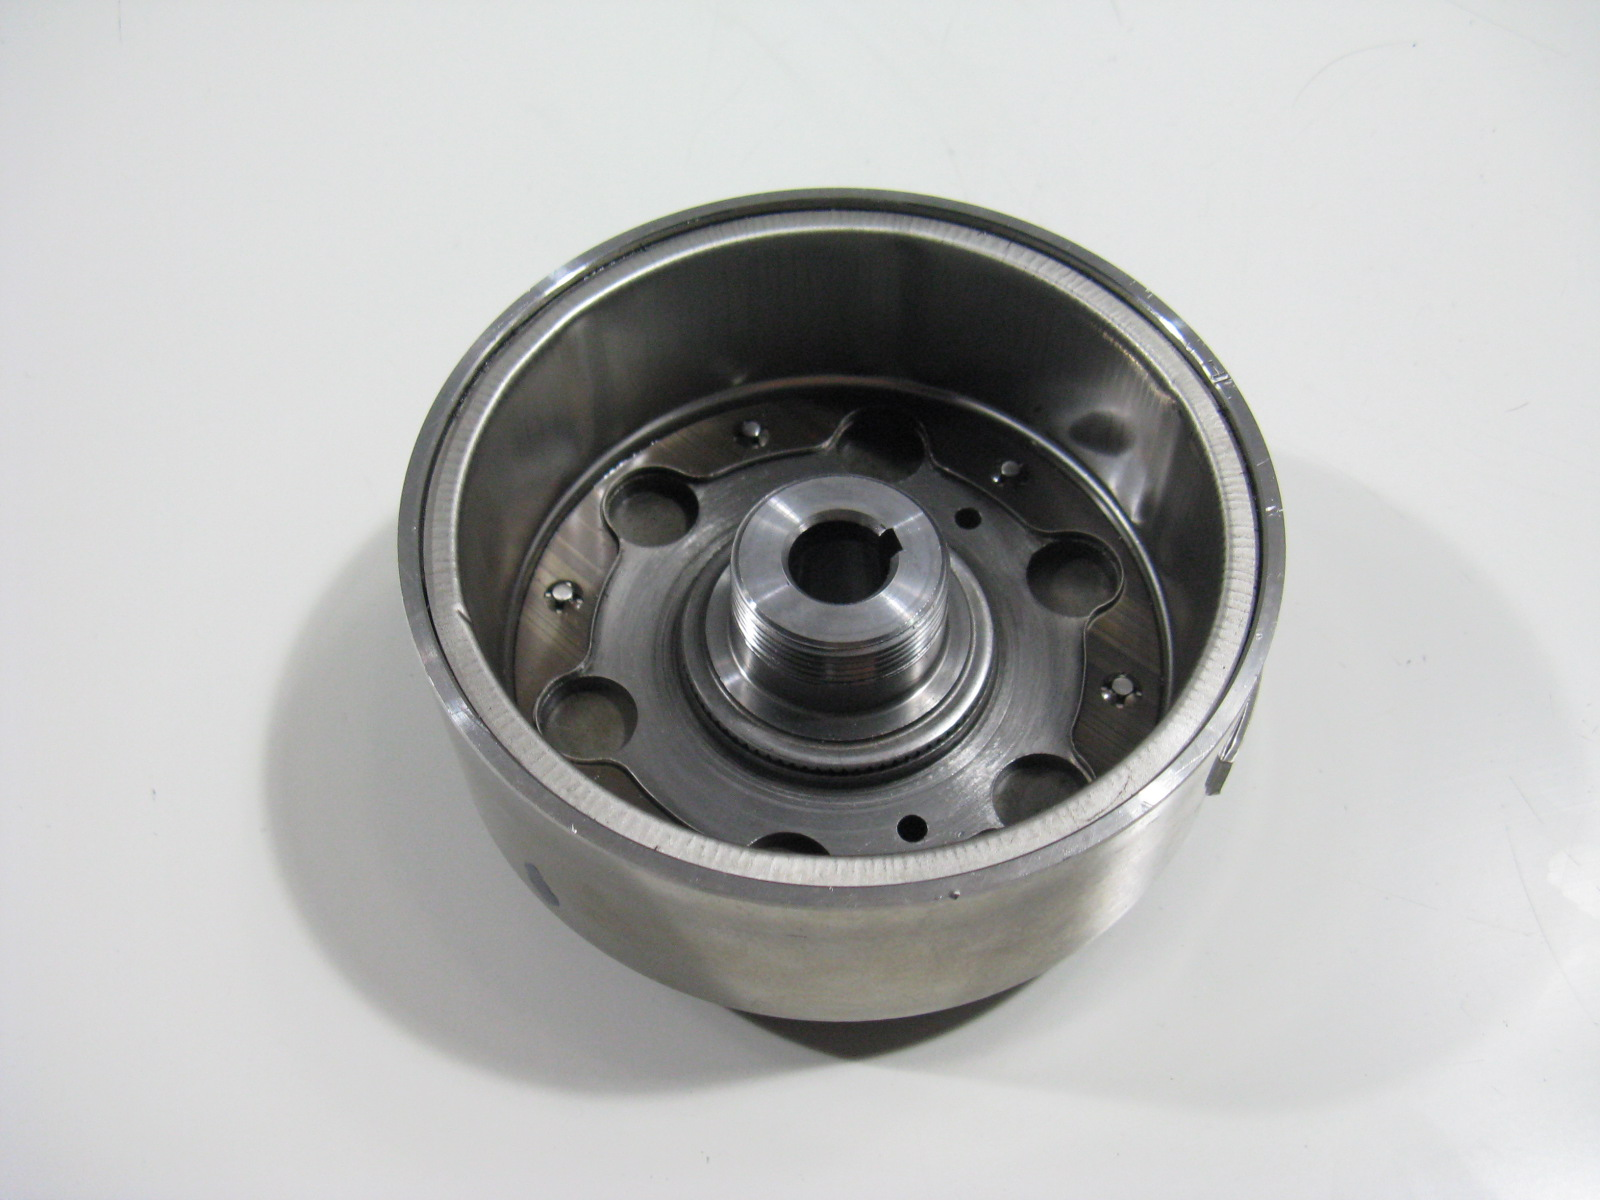 Lichtmaschine-Rotor-Polrad-Generator-Flywheel-Peugeot-Elyseo-125-99-04